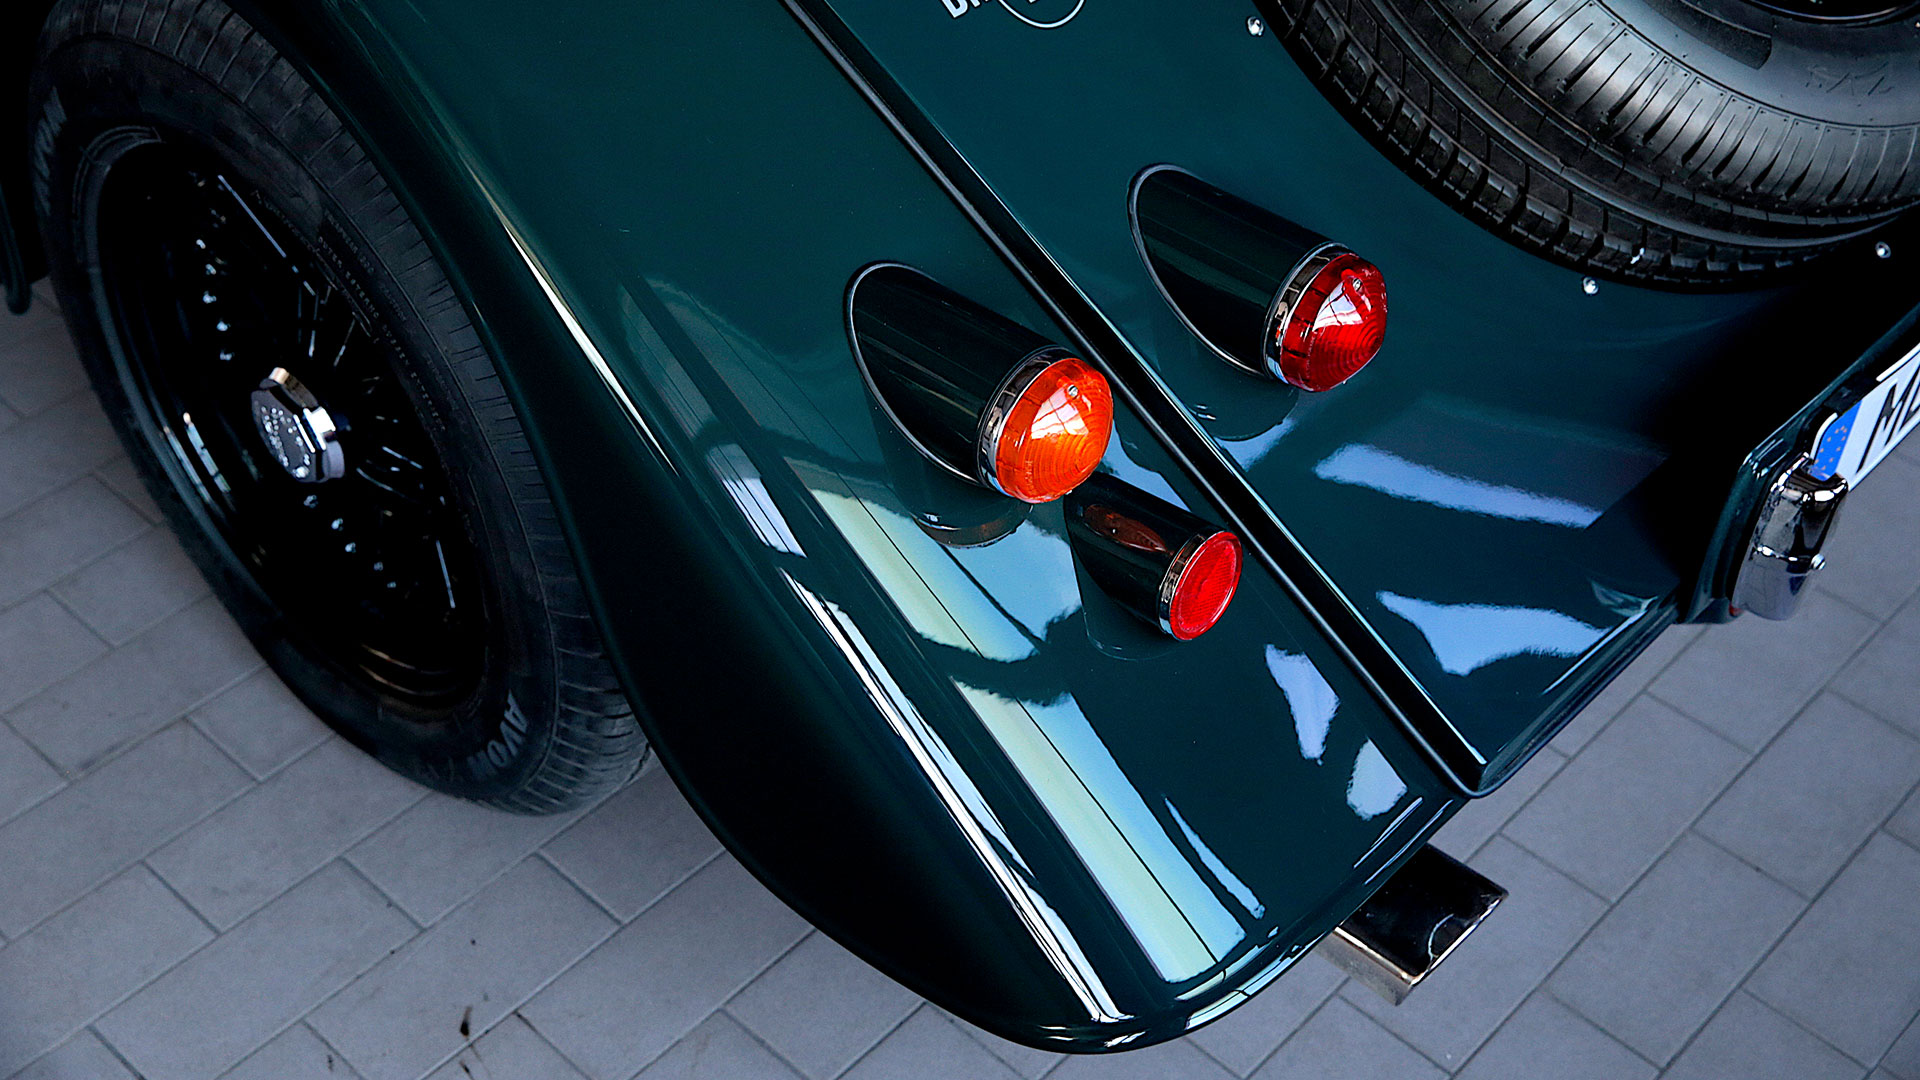 SSR Classic – Oldtimer Karosseriebau Ergebnis